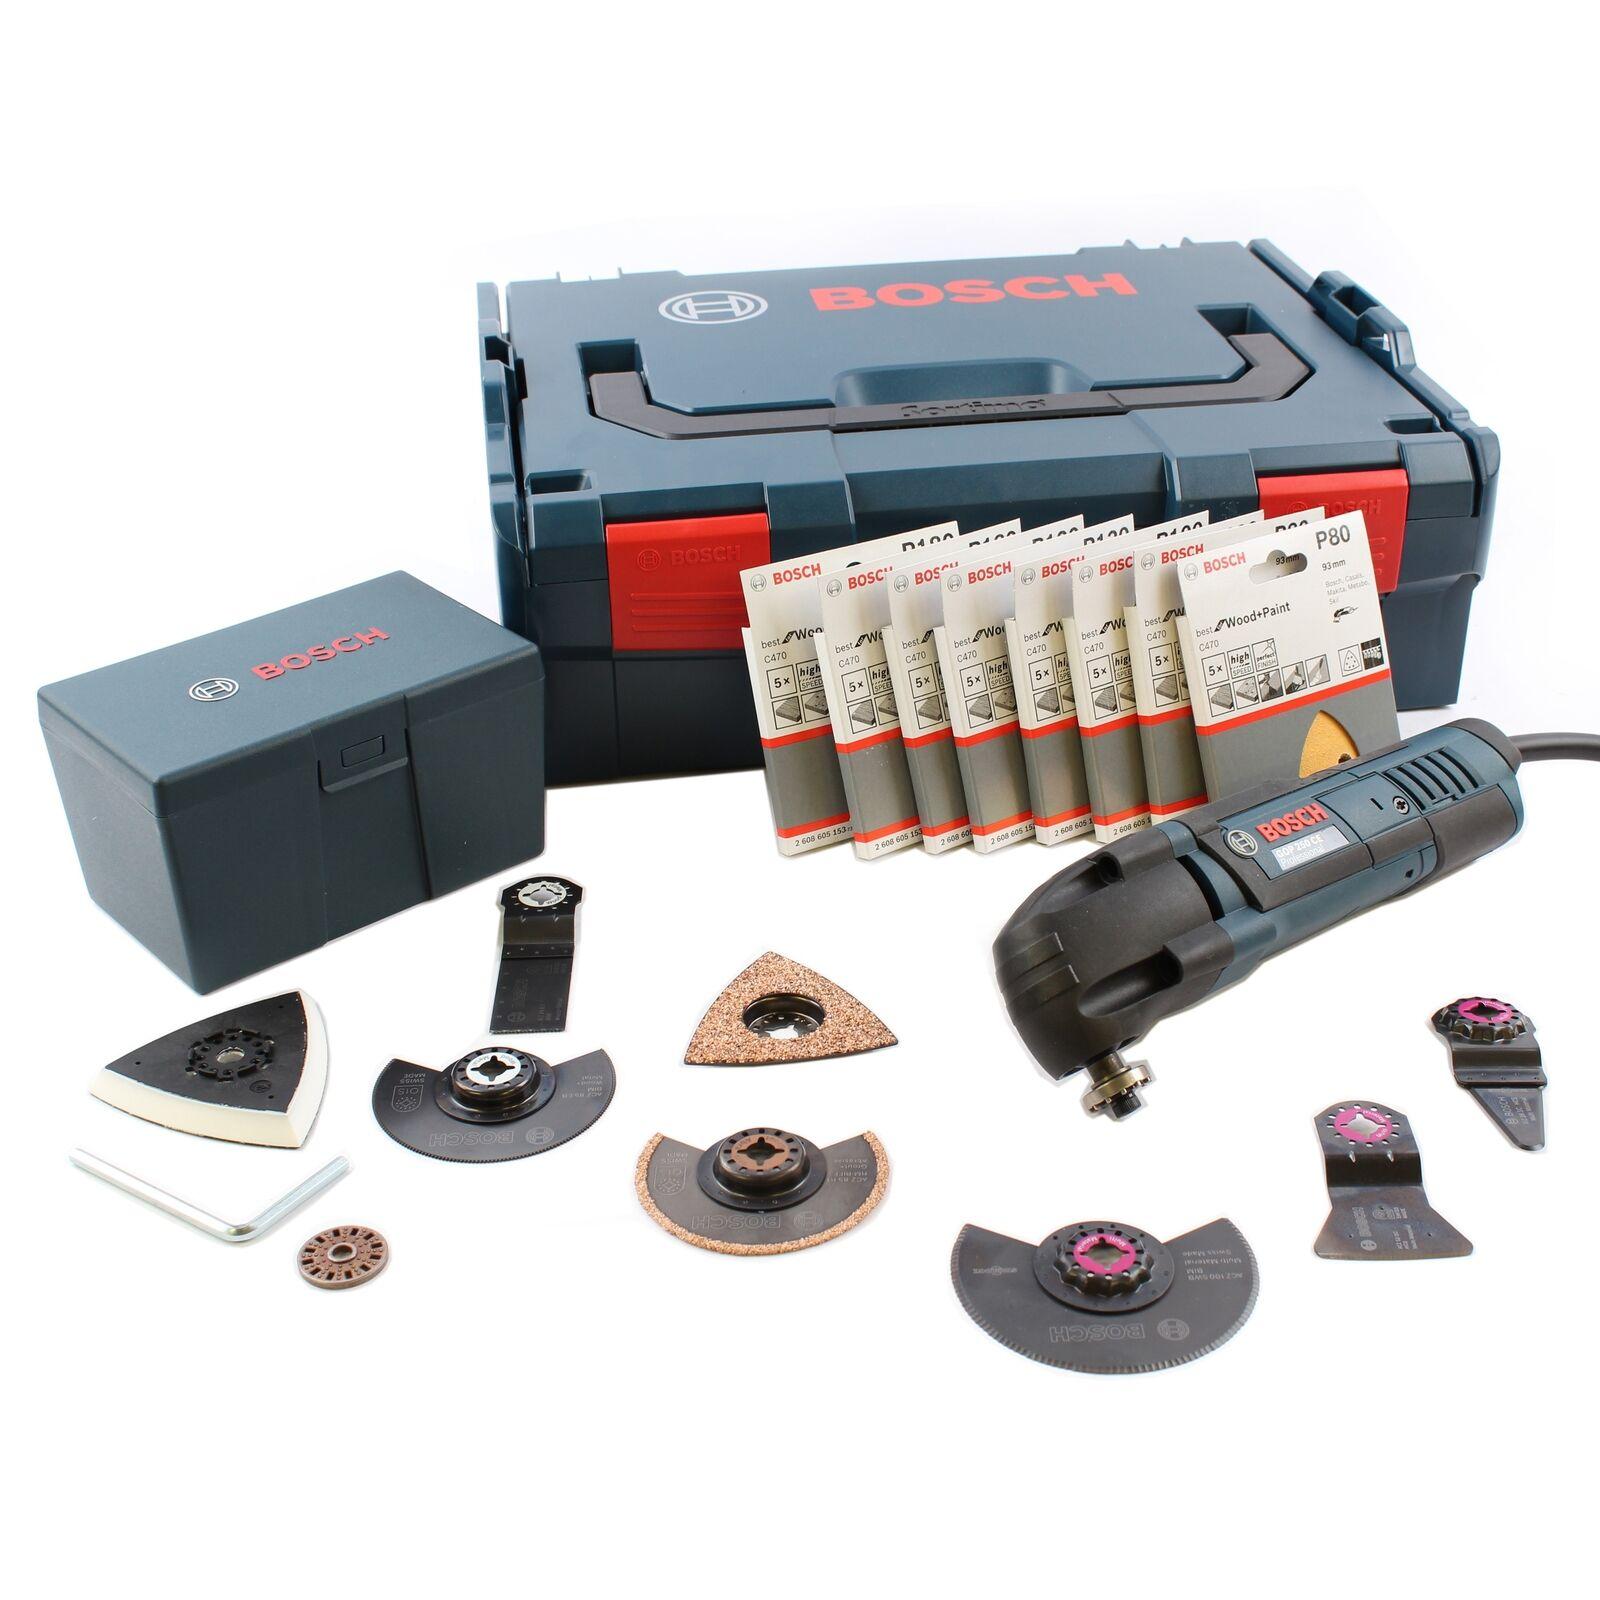 Bosch Professional GOP 250 CE Multifunktionswerkzeug + 48tlg. Zubehör + L-Boxx